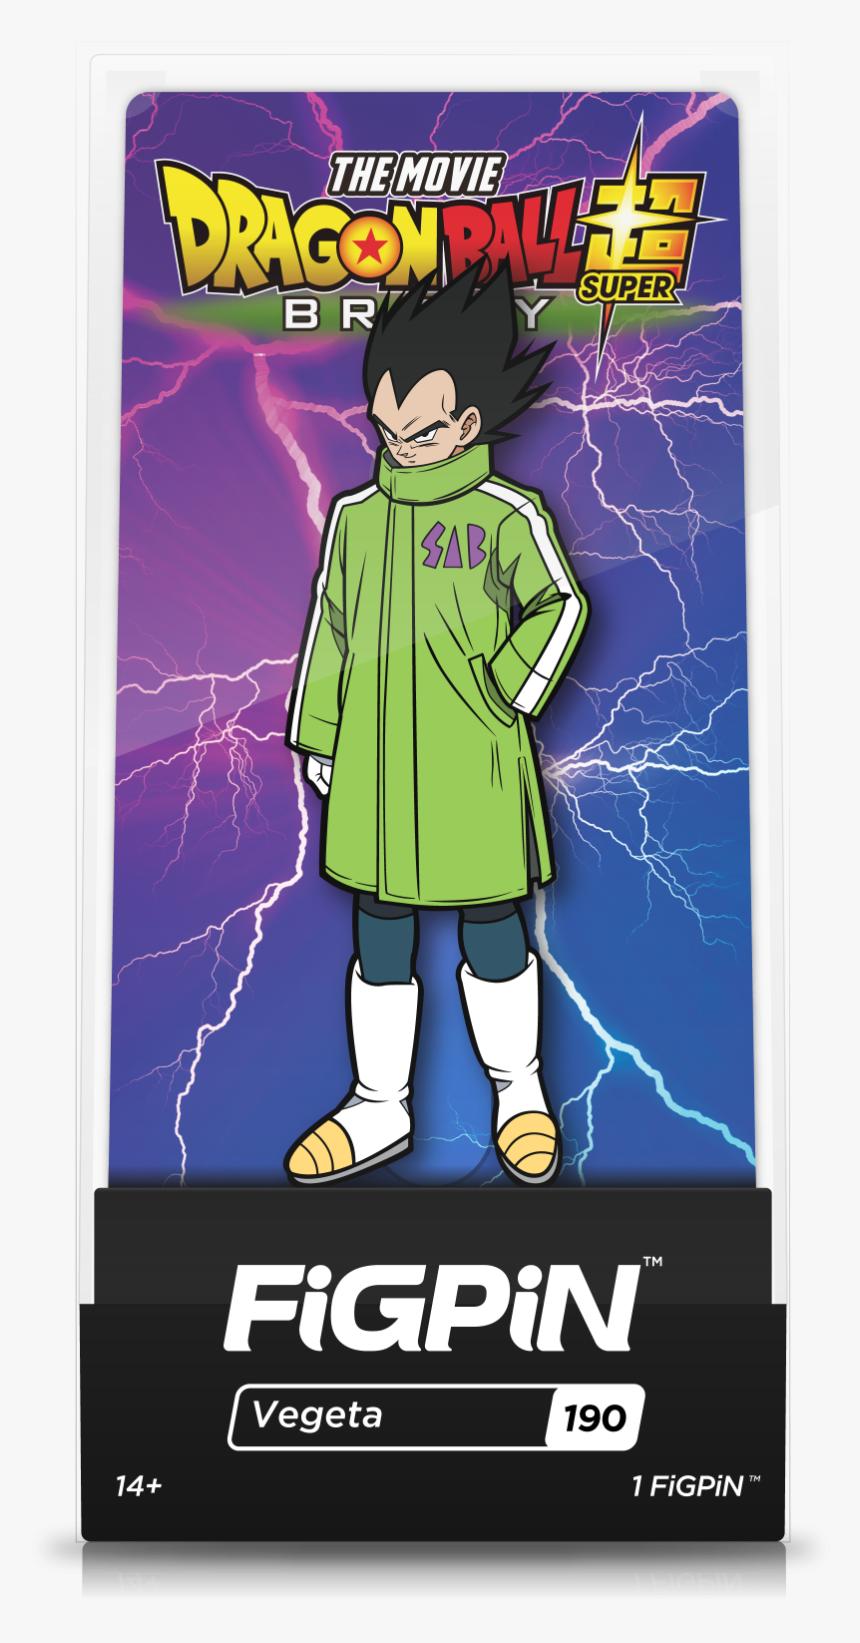 Dragon Ball Super Figpin, HD Png Download, Free Download